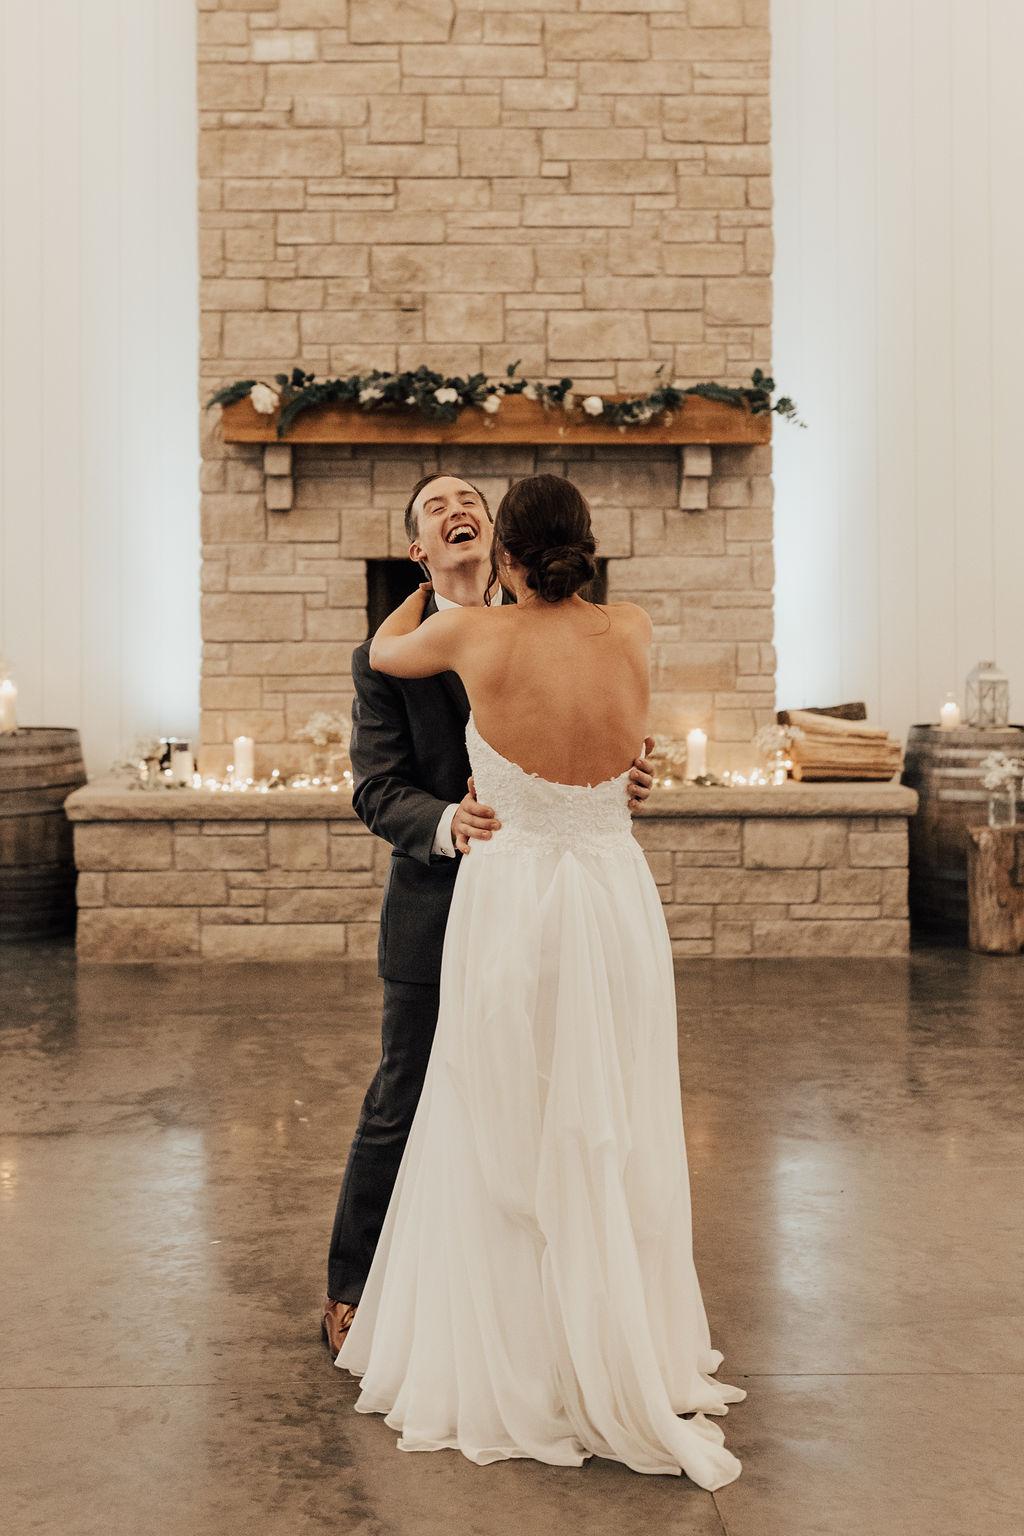 StLouis-Wedding-Photographer-Taylor+Michael-Reception139.jpg